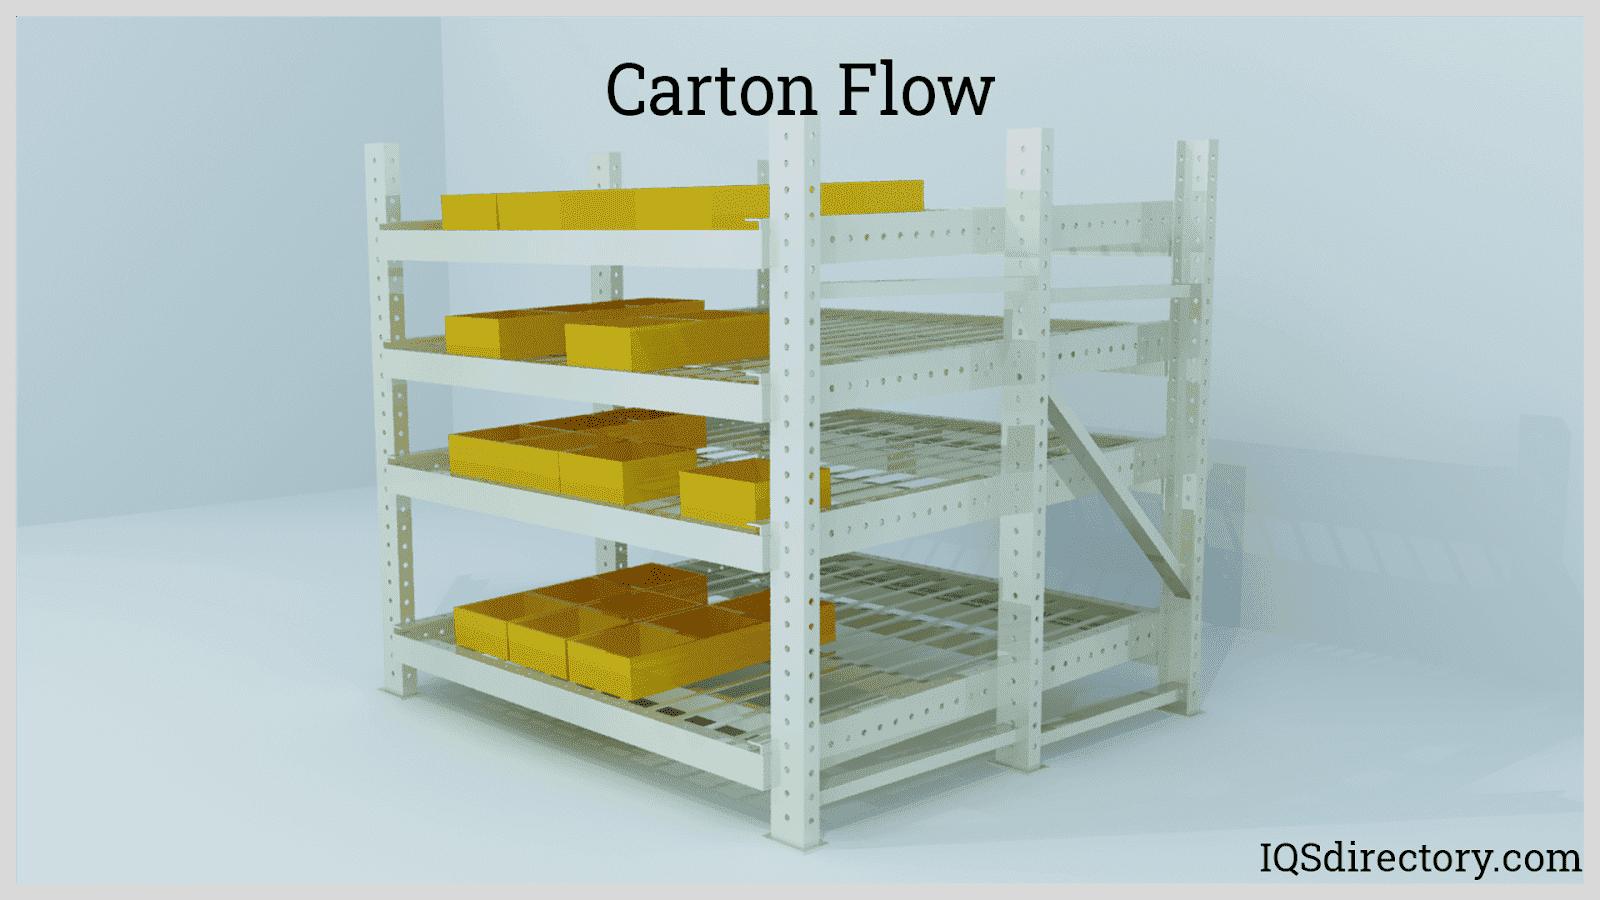 Carton Flow